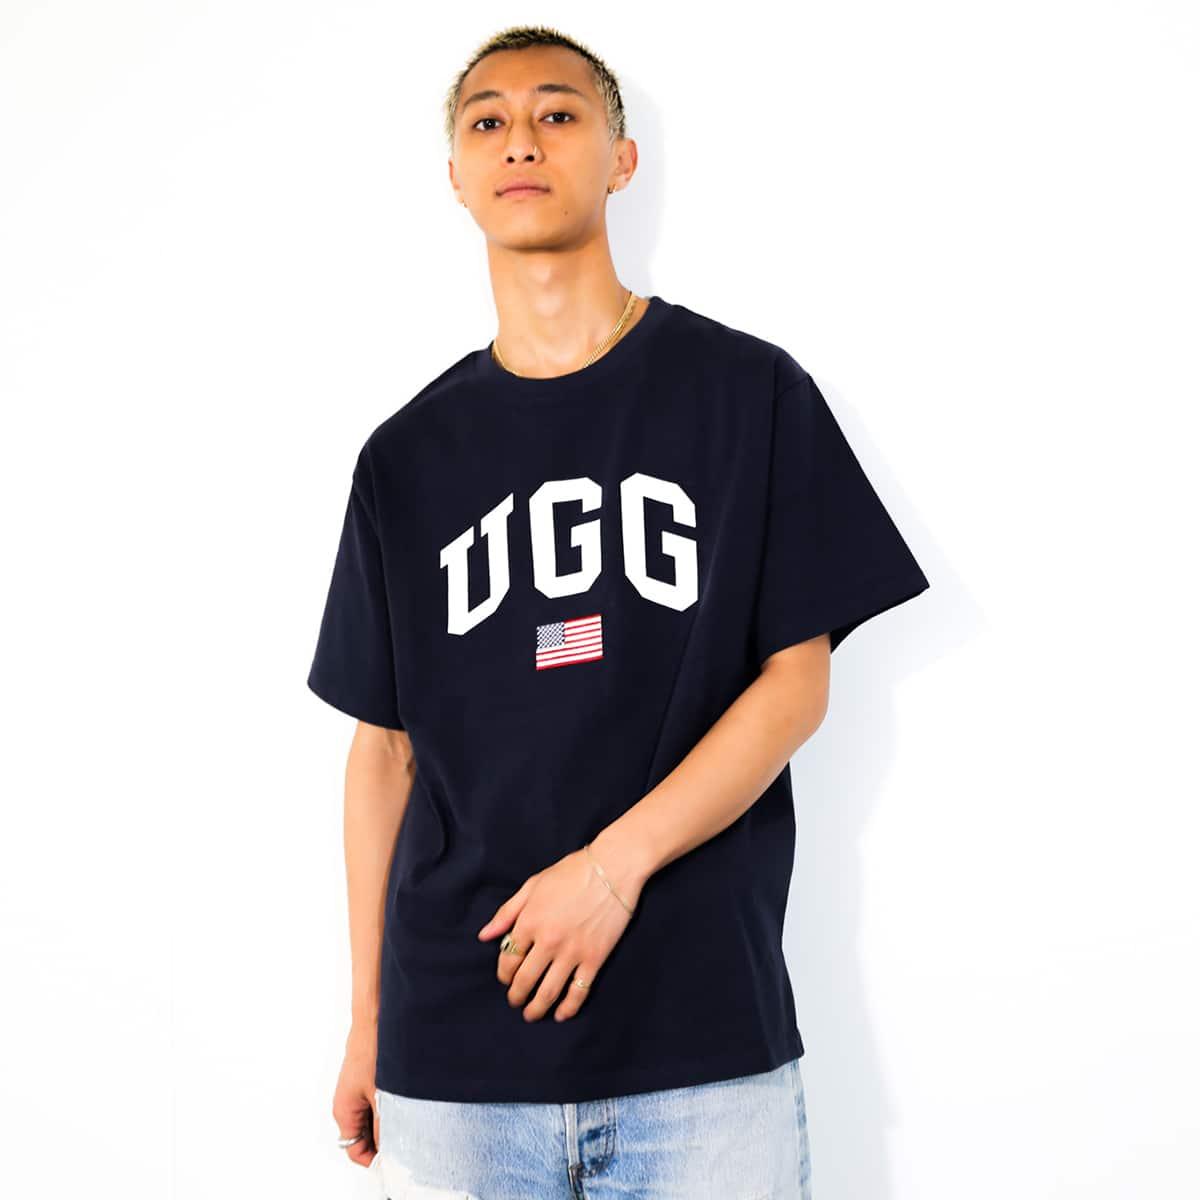 UGG US 刺繍ロゴ Tシャツ NAVY 21FW-I_photo_large